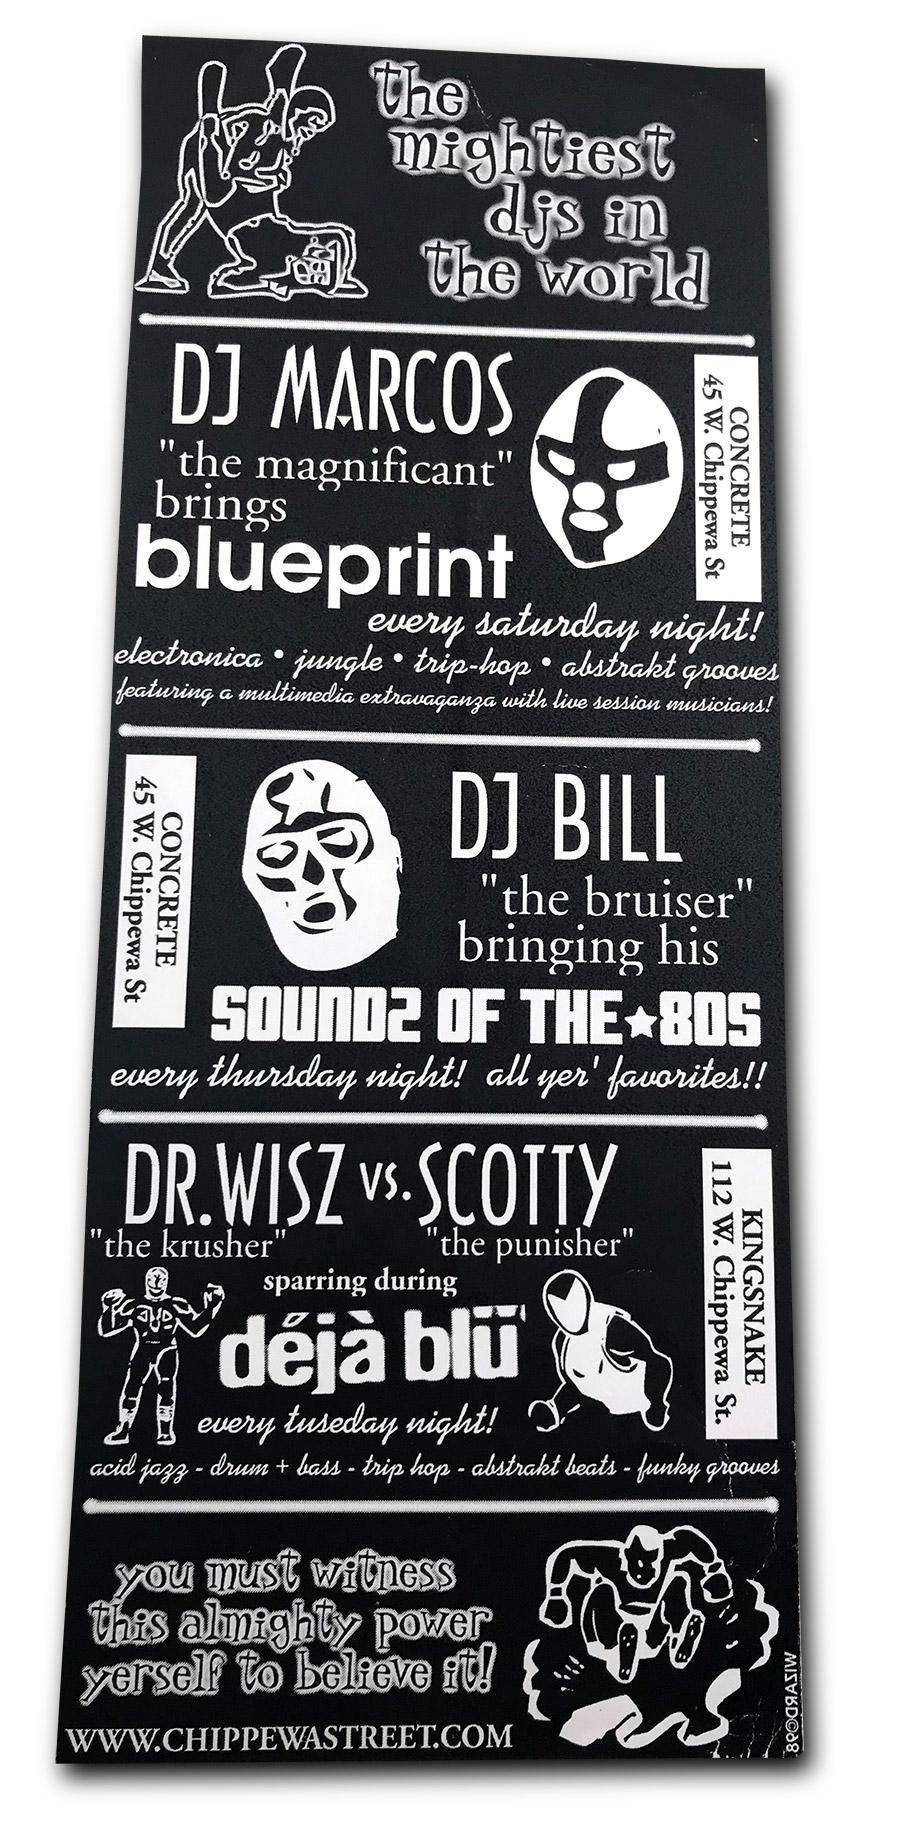 DJs, Concrete, Buffalo NY, Kingsnake Lounge, dejablu, deja blu, Dr Wisz, DJ Scotty, poster design